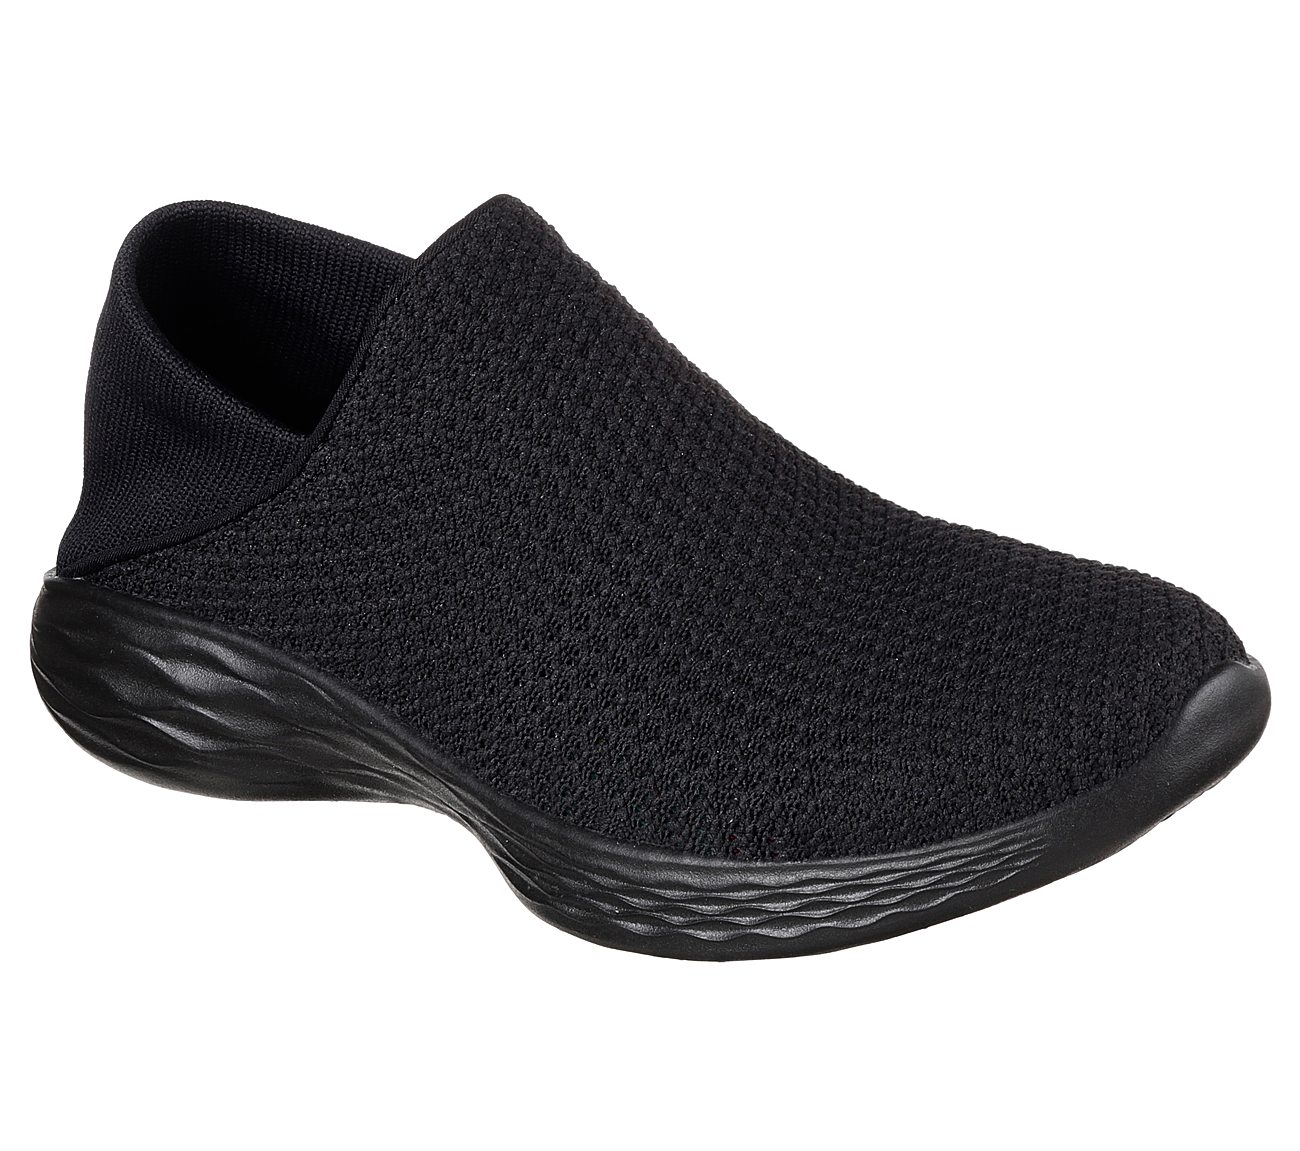 Skechers Women's You Movement Slip On Shoe